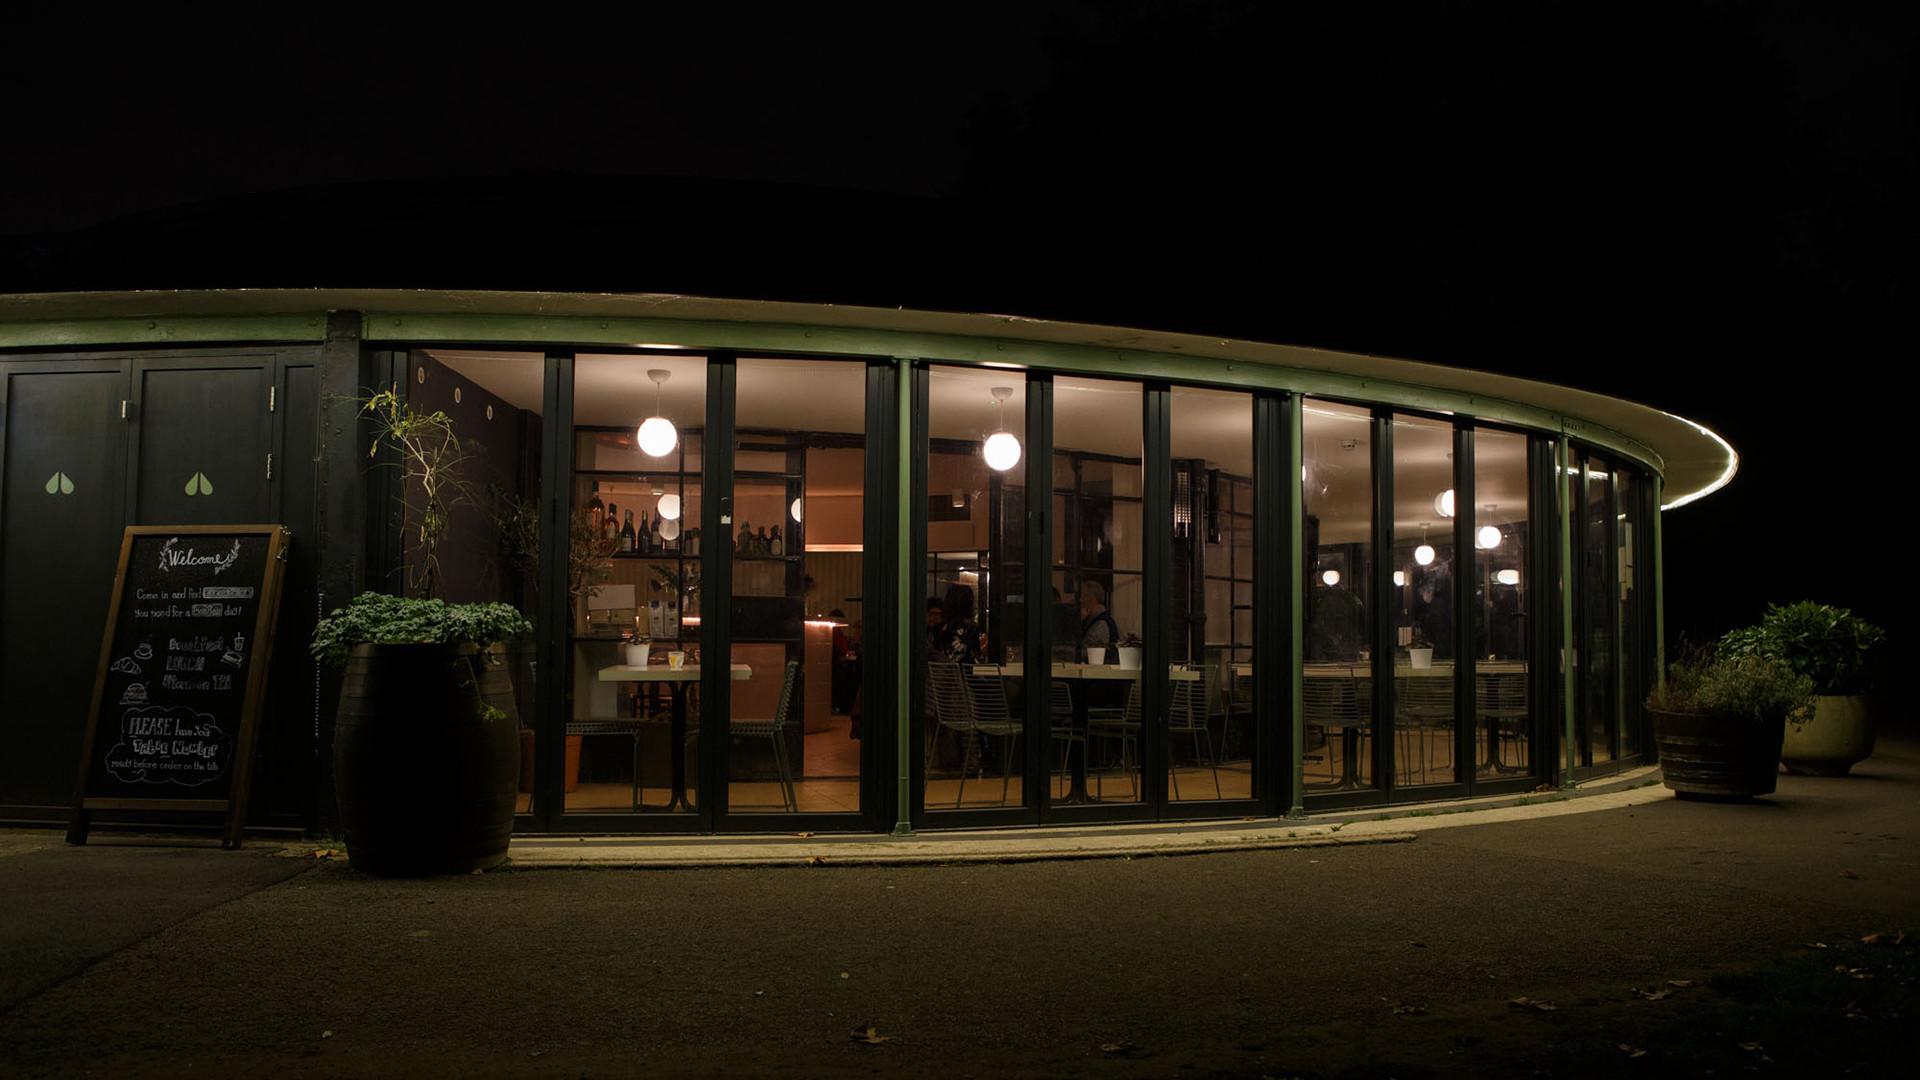 Pear Tree Café